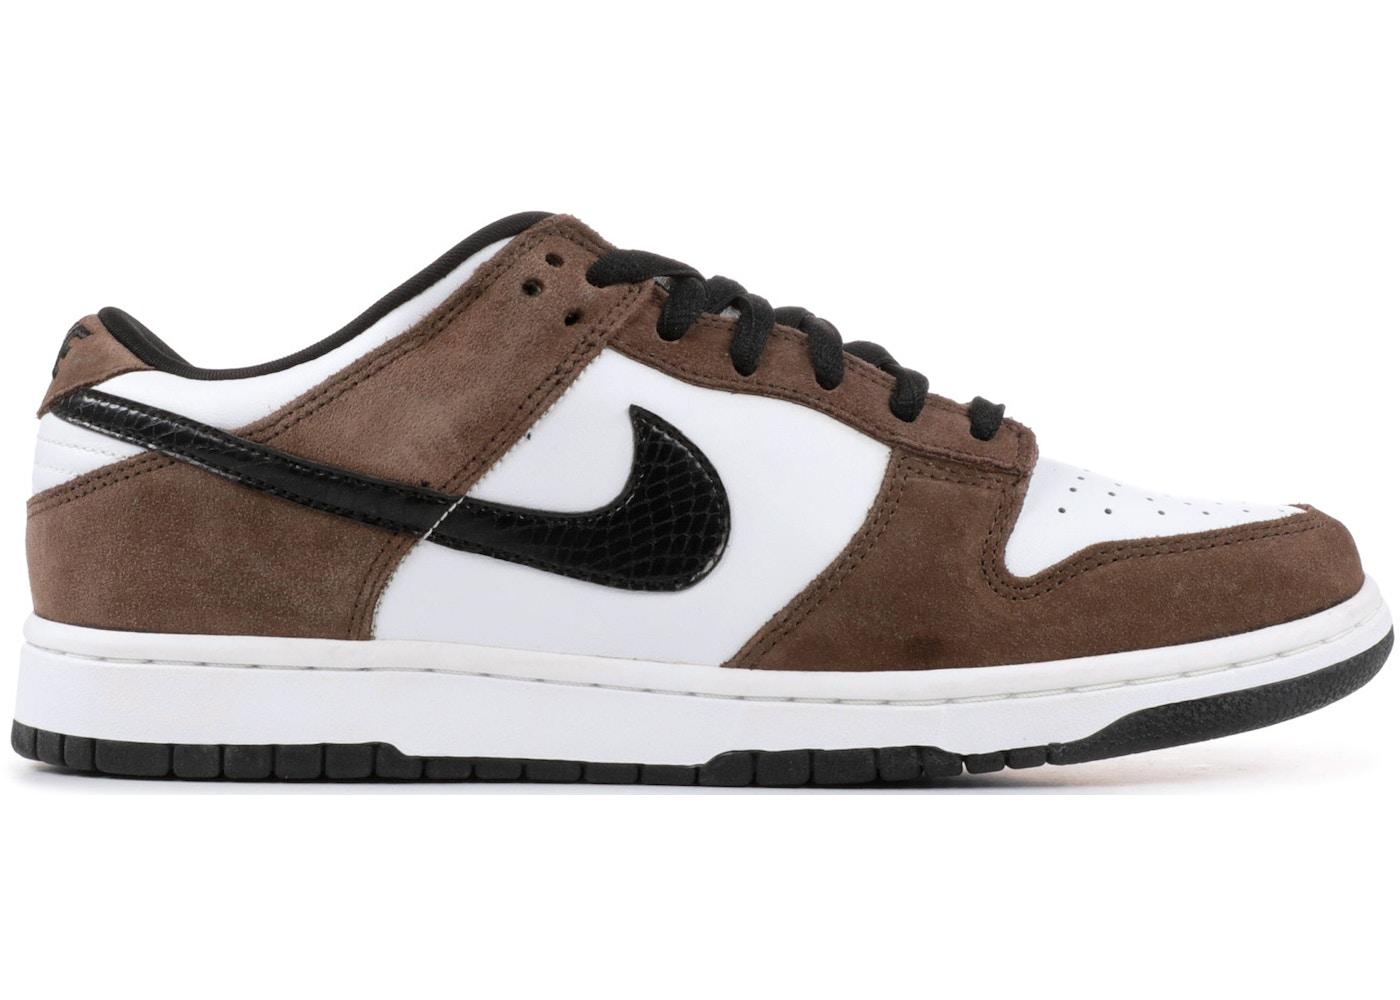 reputable site 8110b 36c86 Nike SB Dunk Low White Black Trail End Brown